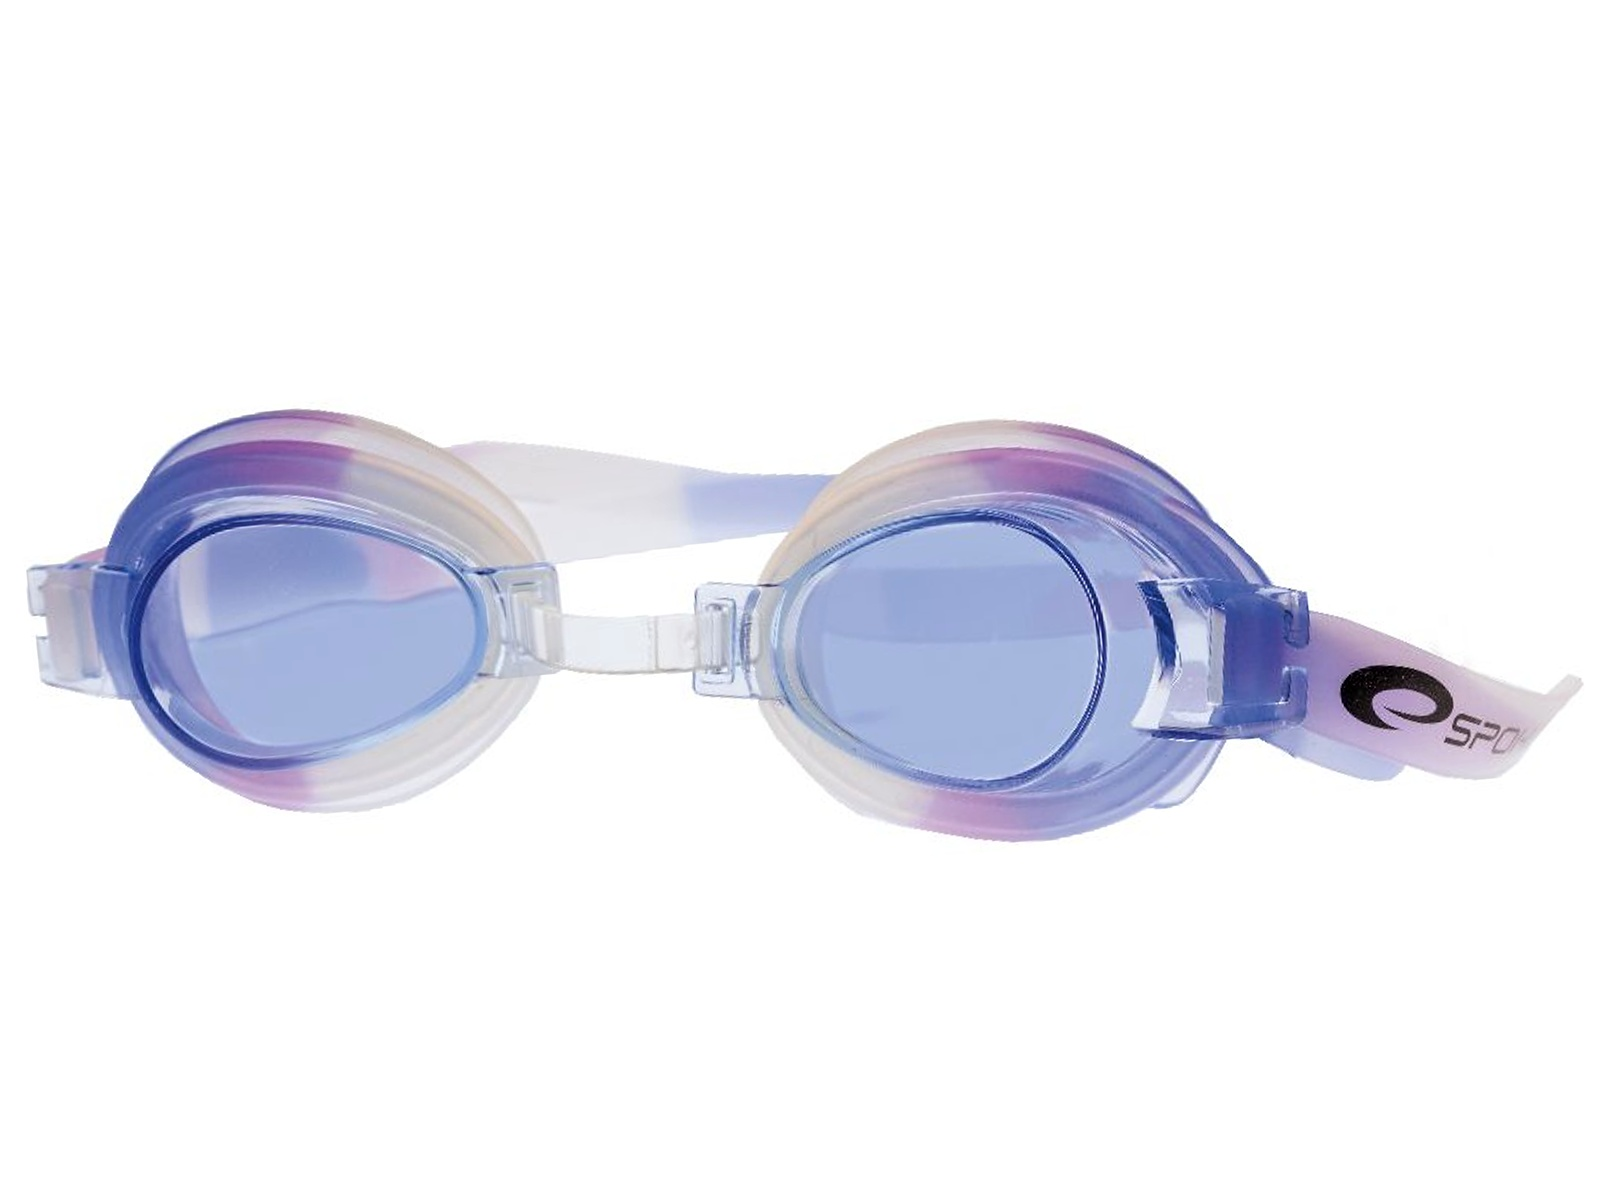 Plavecké brýle SPOKEY Jellyfish - fialové